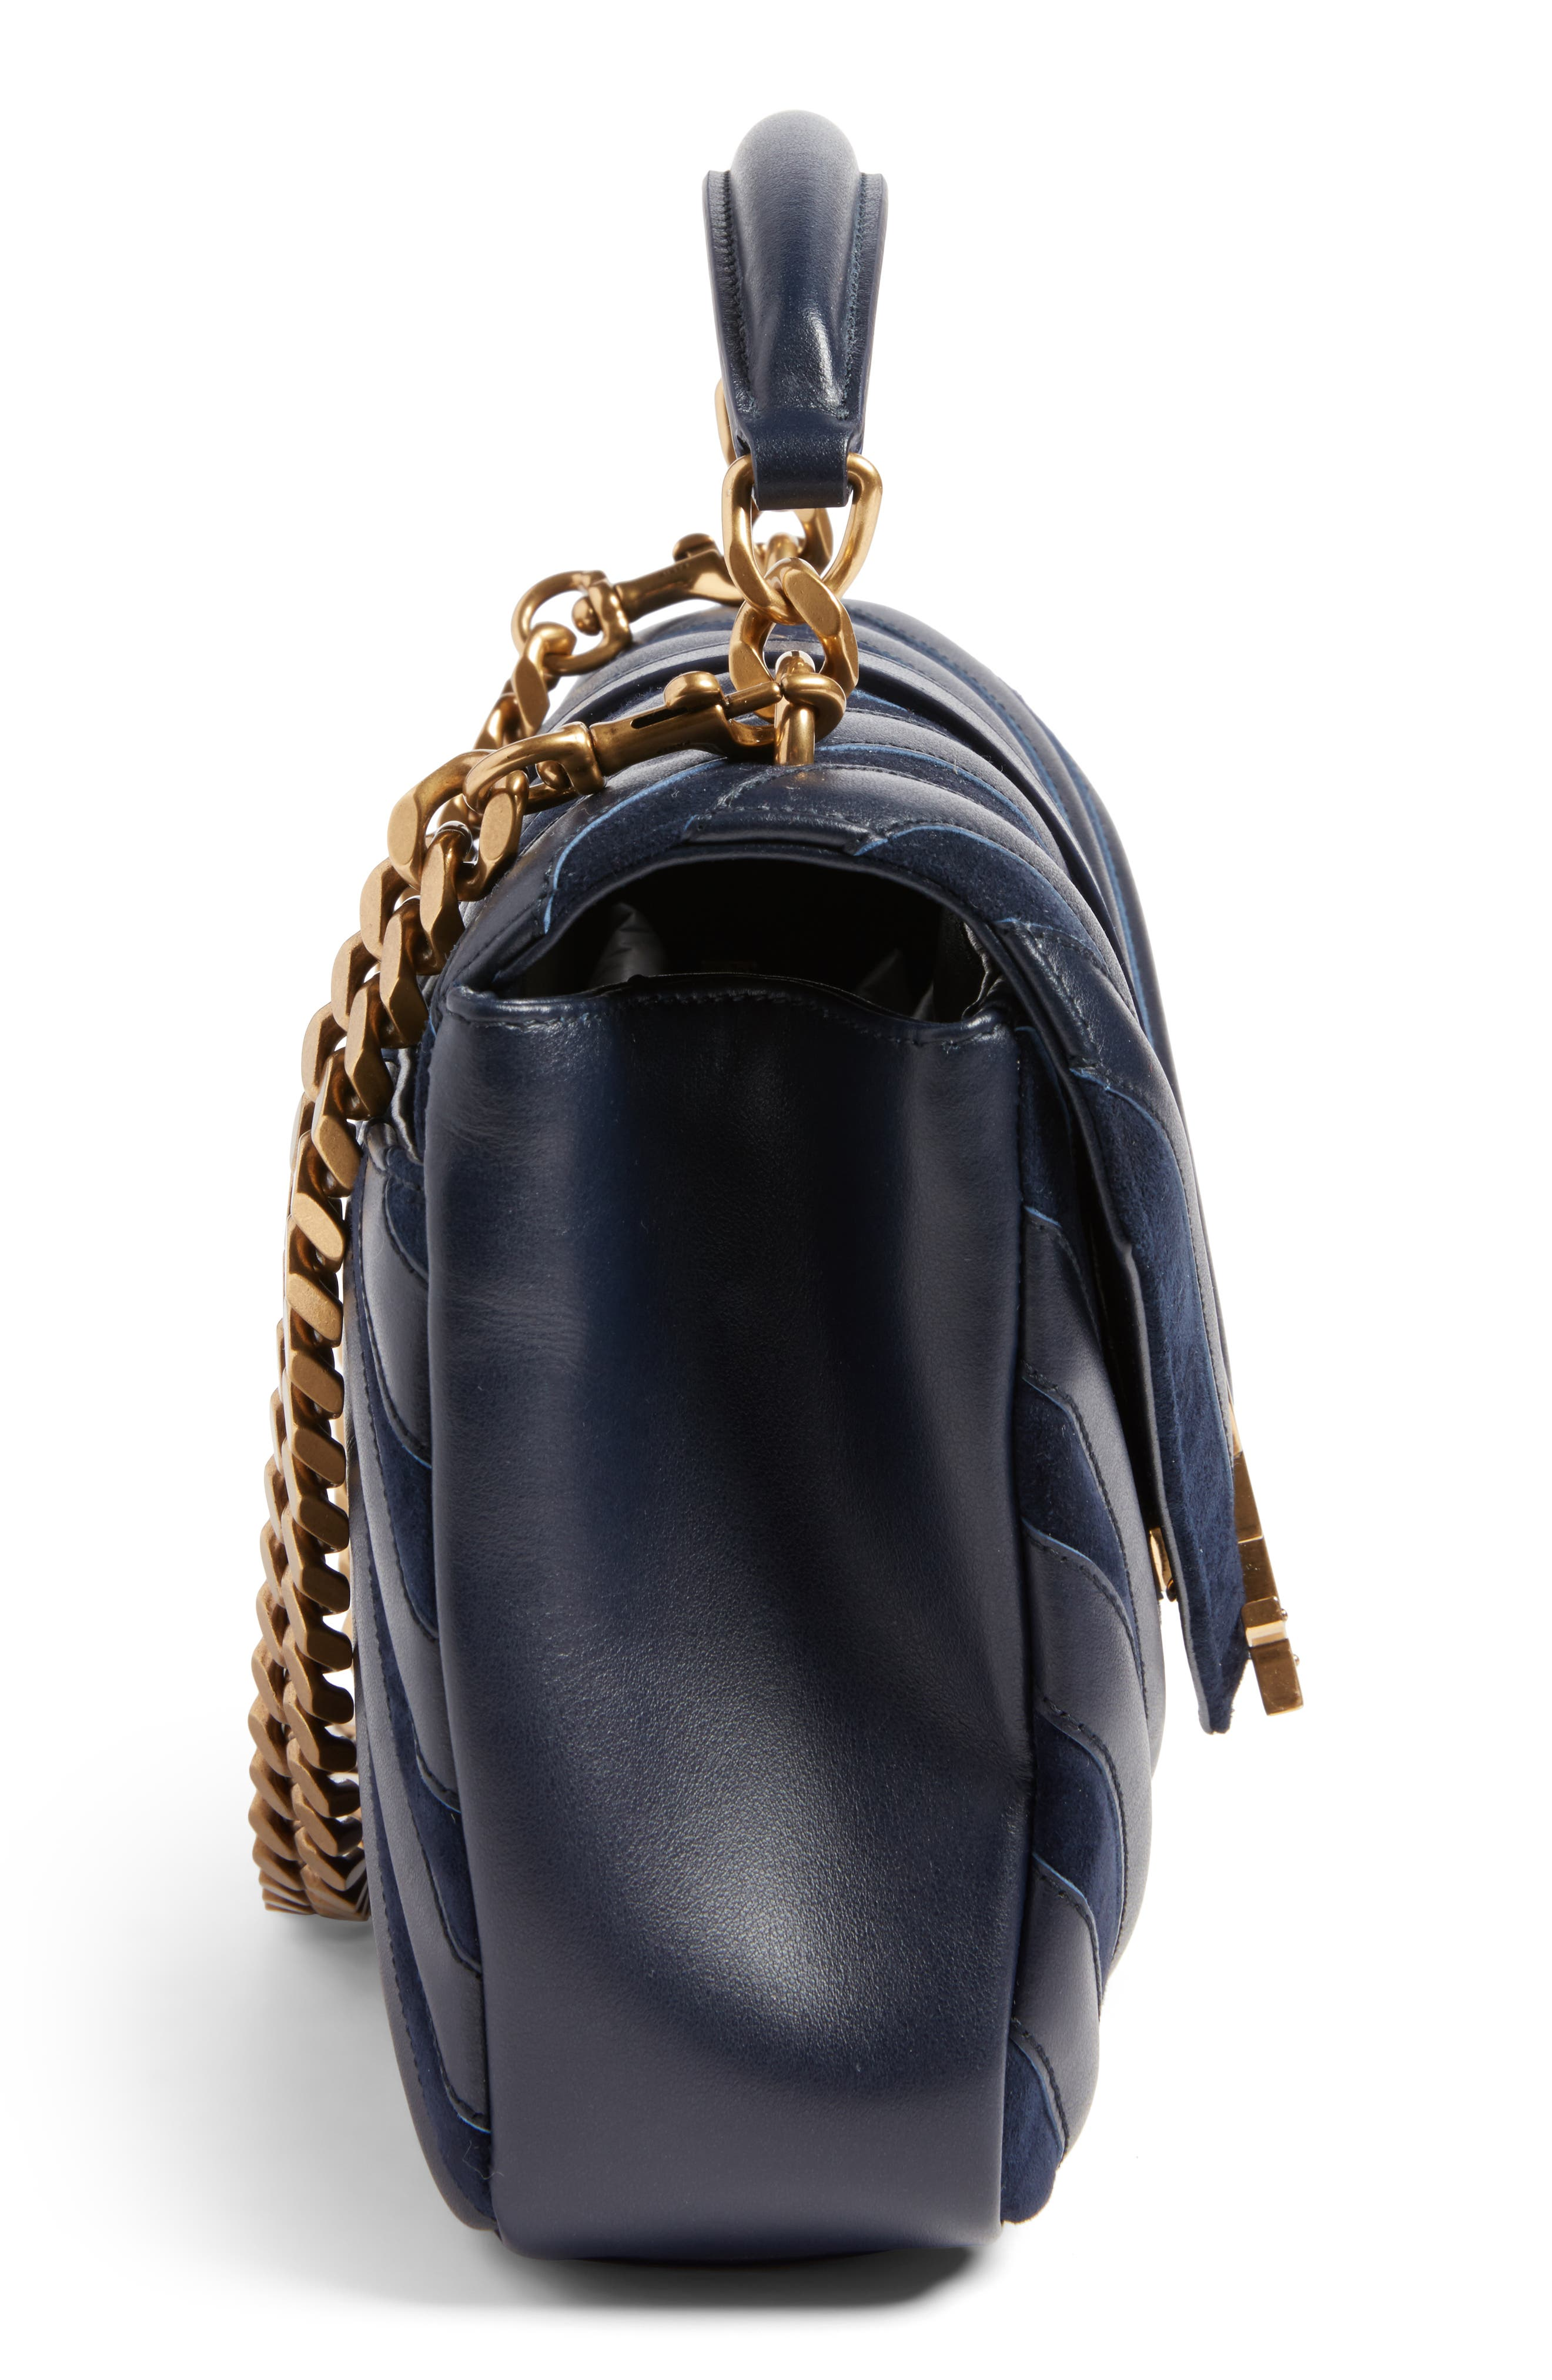 Medium College Patchwork Suede & Leather Shoulder Bag,                             Alternate thumbnail 5, color,                             Deep Marine